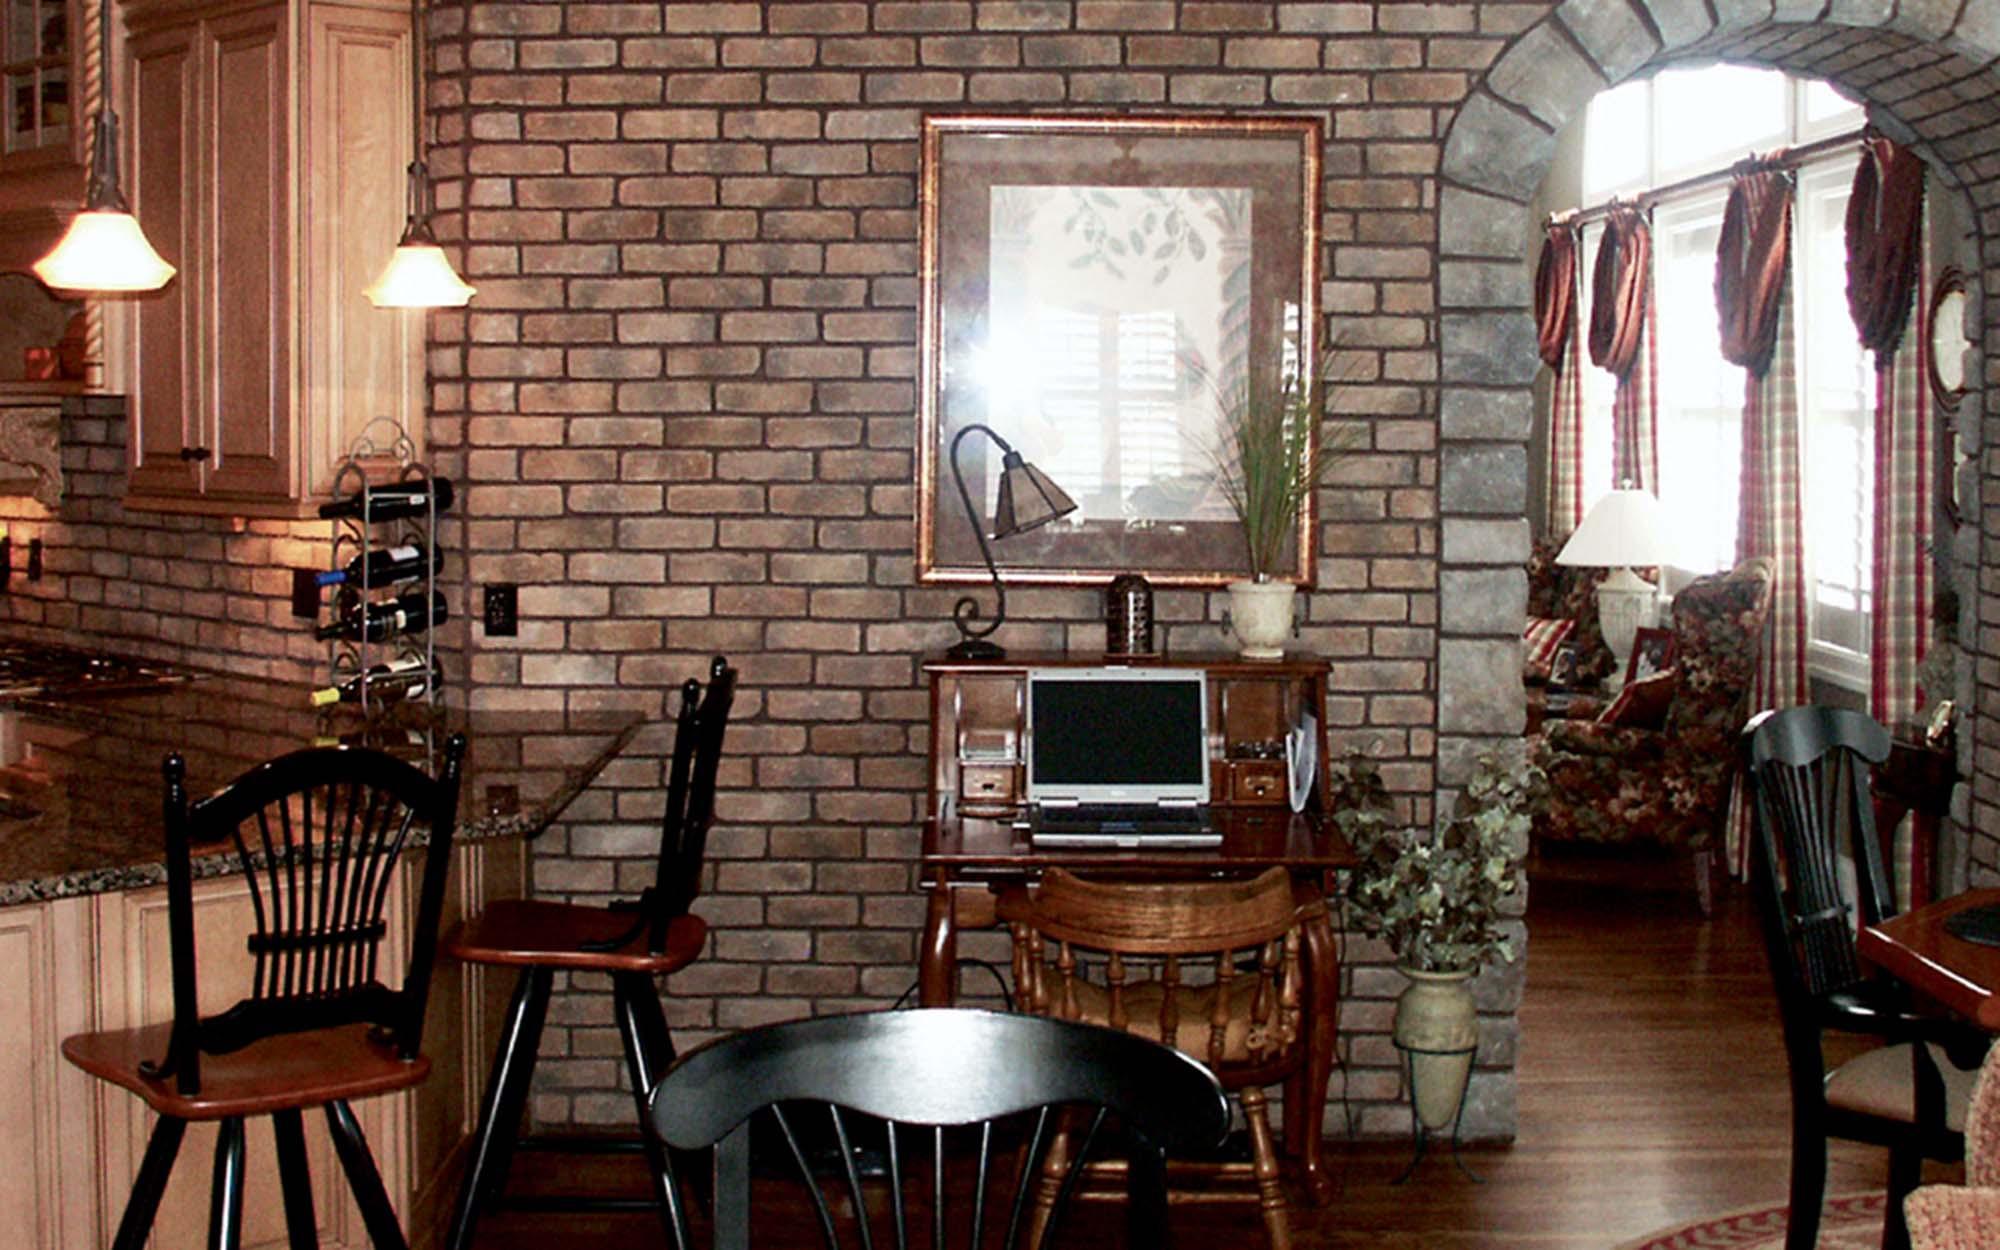 Coronado Stone Thin Brick - Coronado Stone has multiple colors and shapes of of their manufactured thin brick.